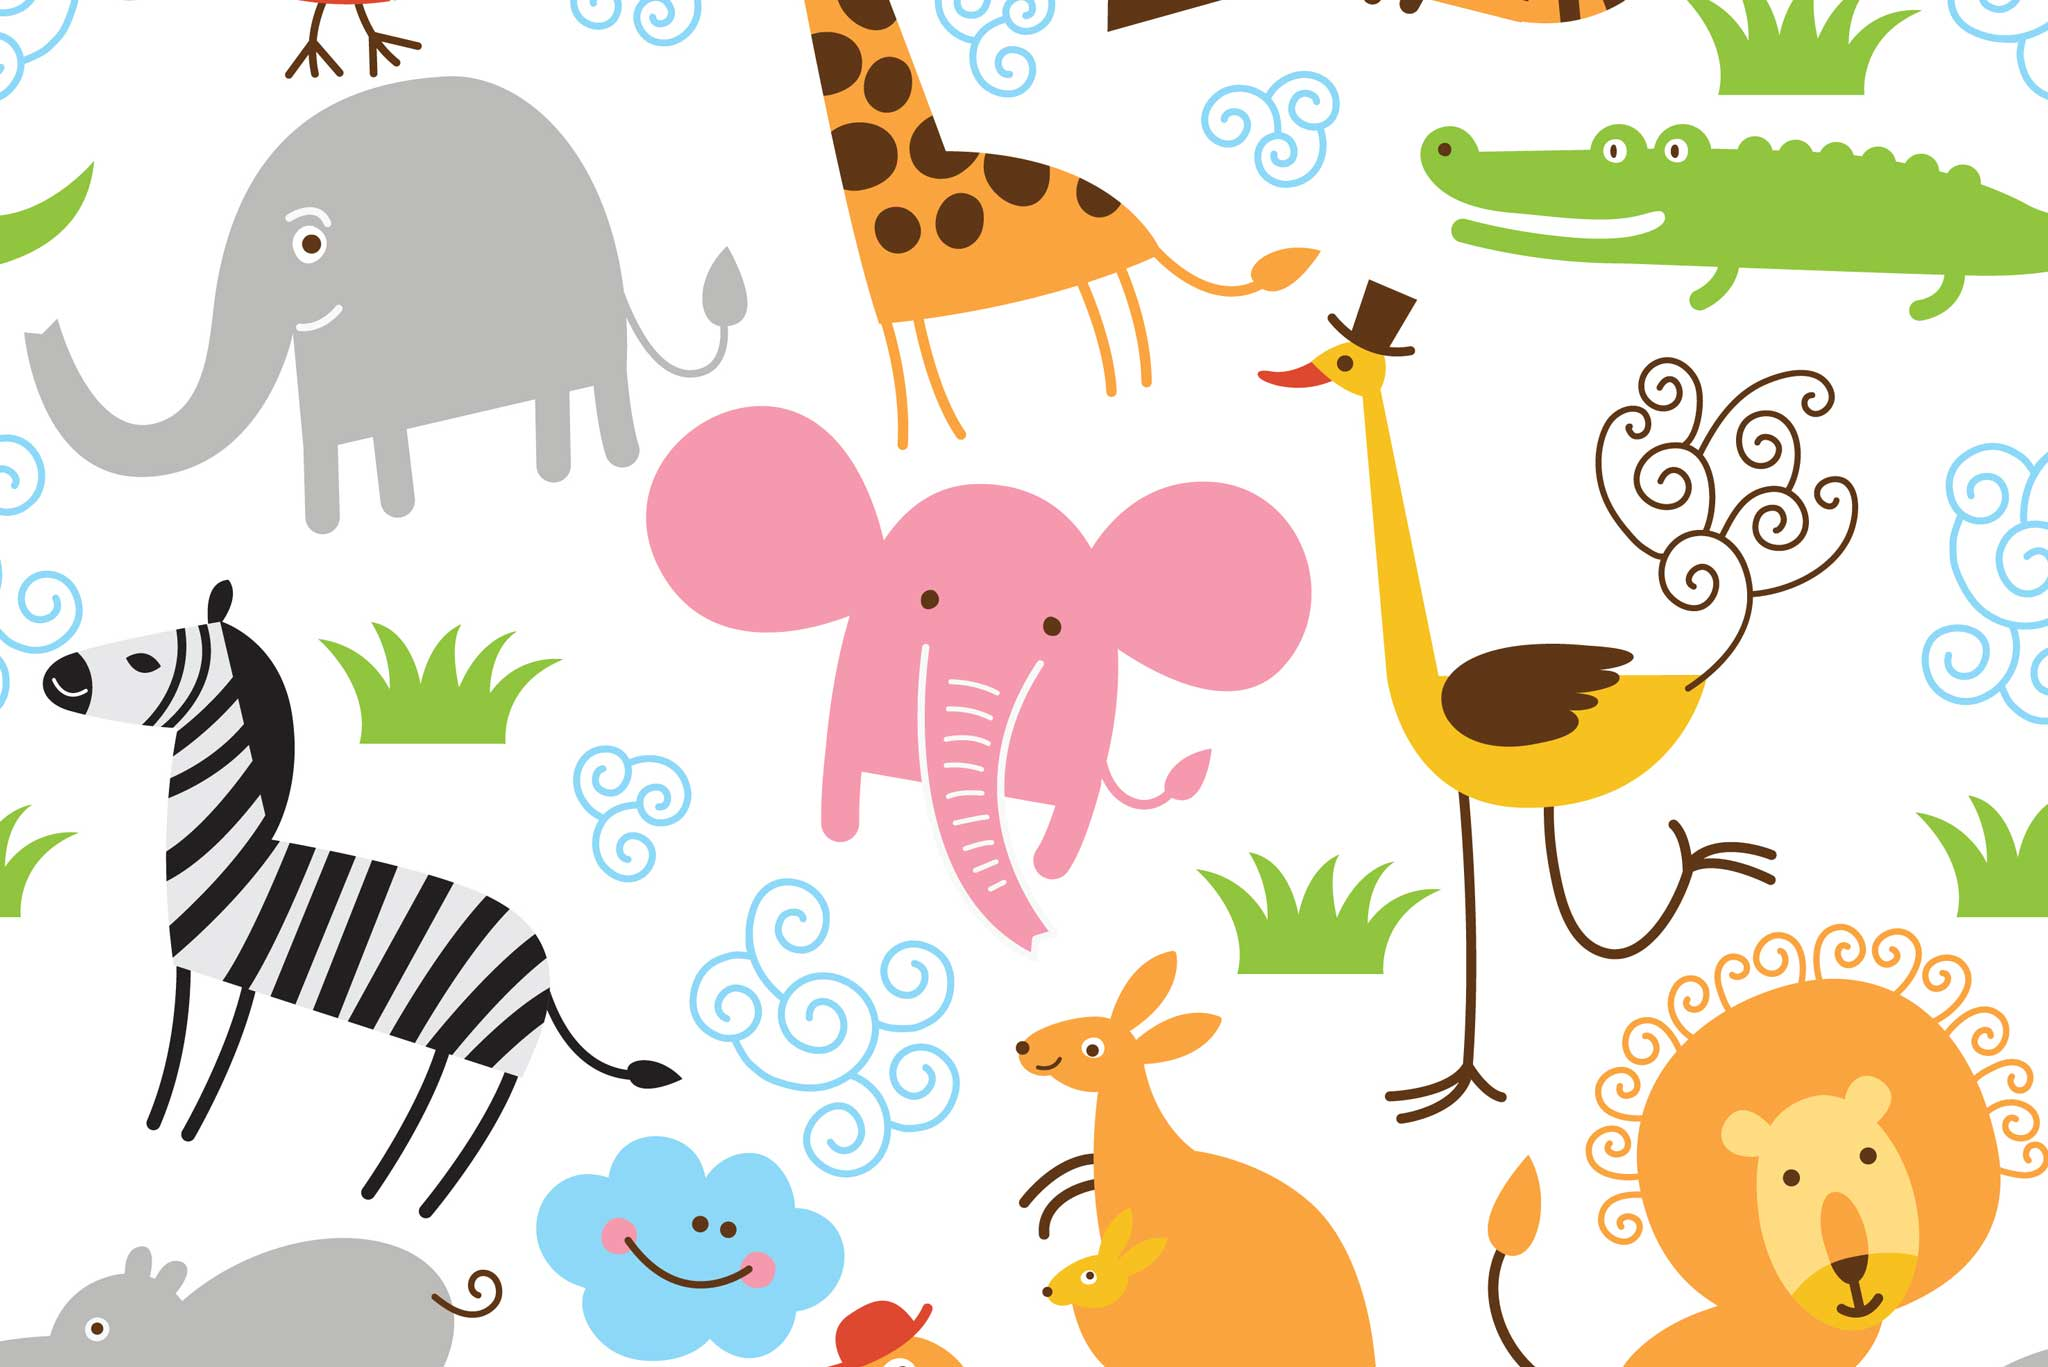 tapet-fototapet-design-decor-mural-customizabil-comanda-personalizat-bucuresti-daring-prints-motiv-model-copii-desen-animale-jungla-safari-multicolor